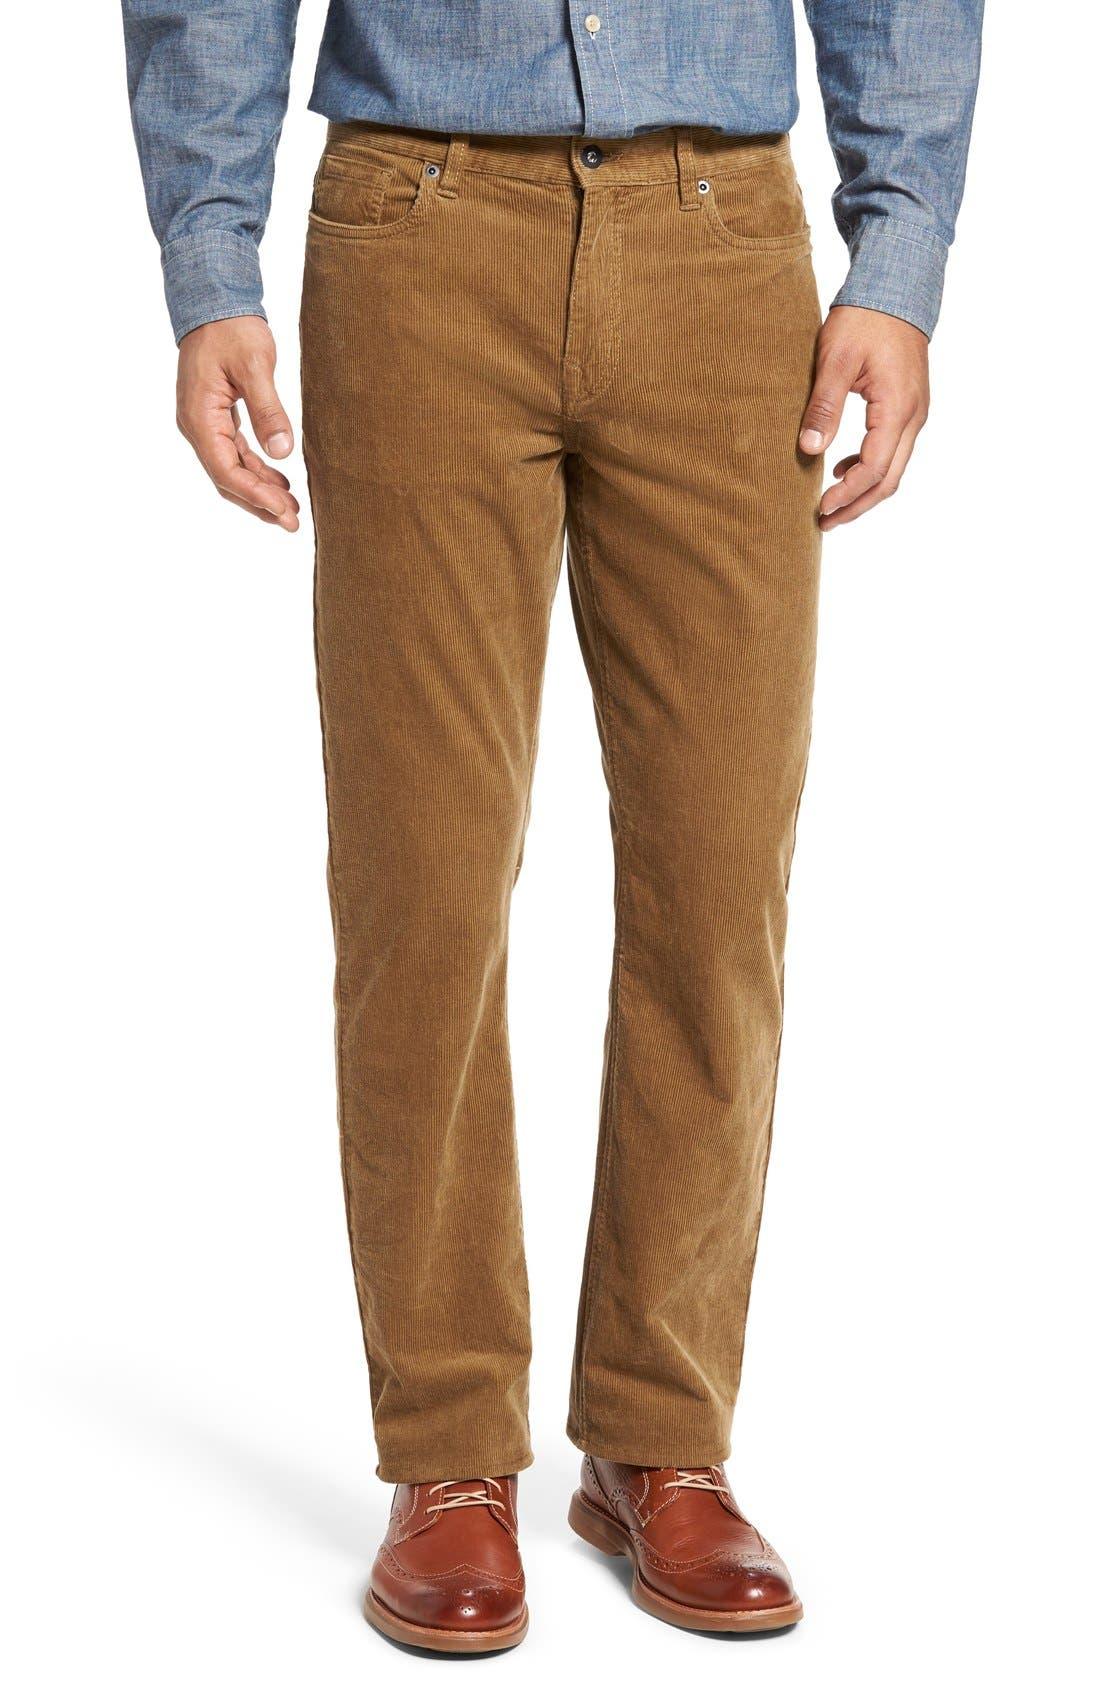 Cutter & Buck 'Greenwood' Stretch Corduroy Pants (Big & Tall)